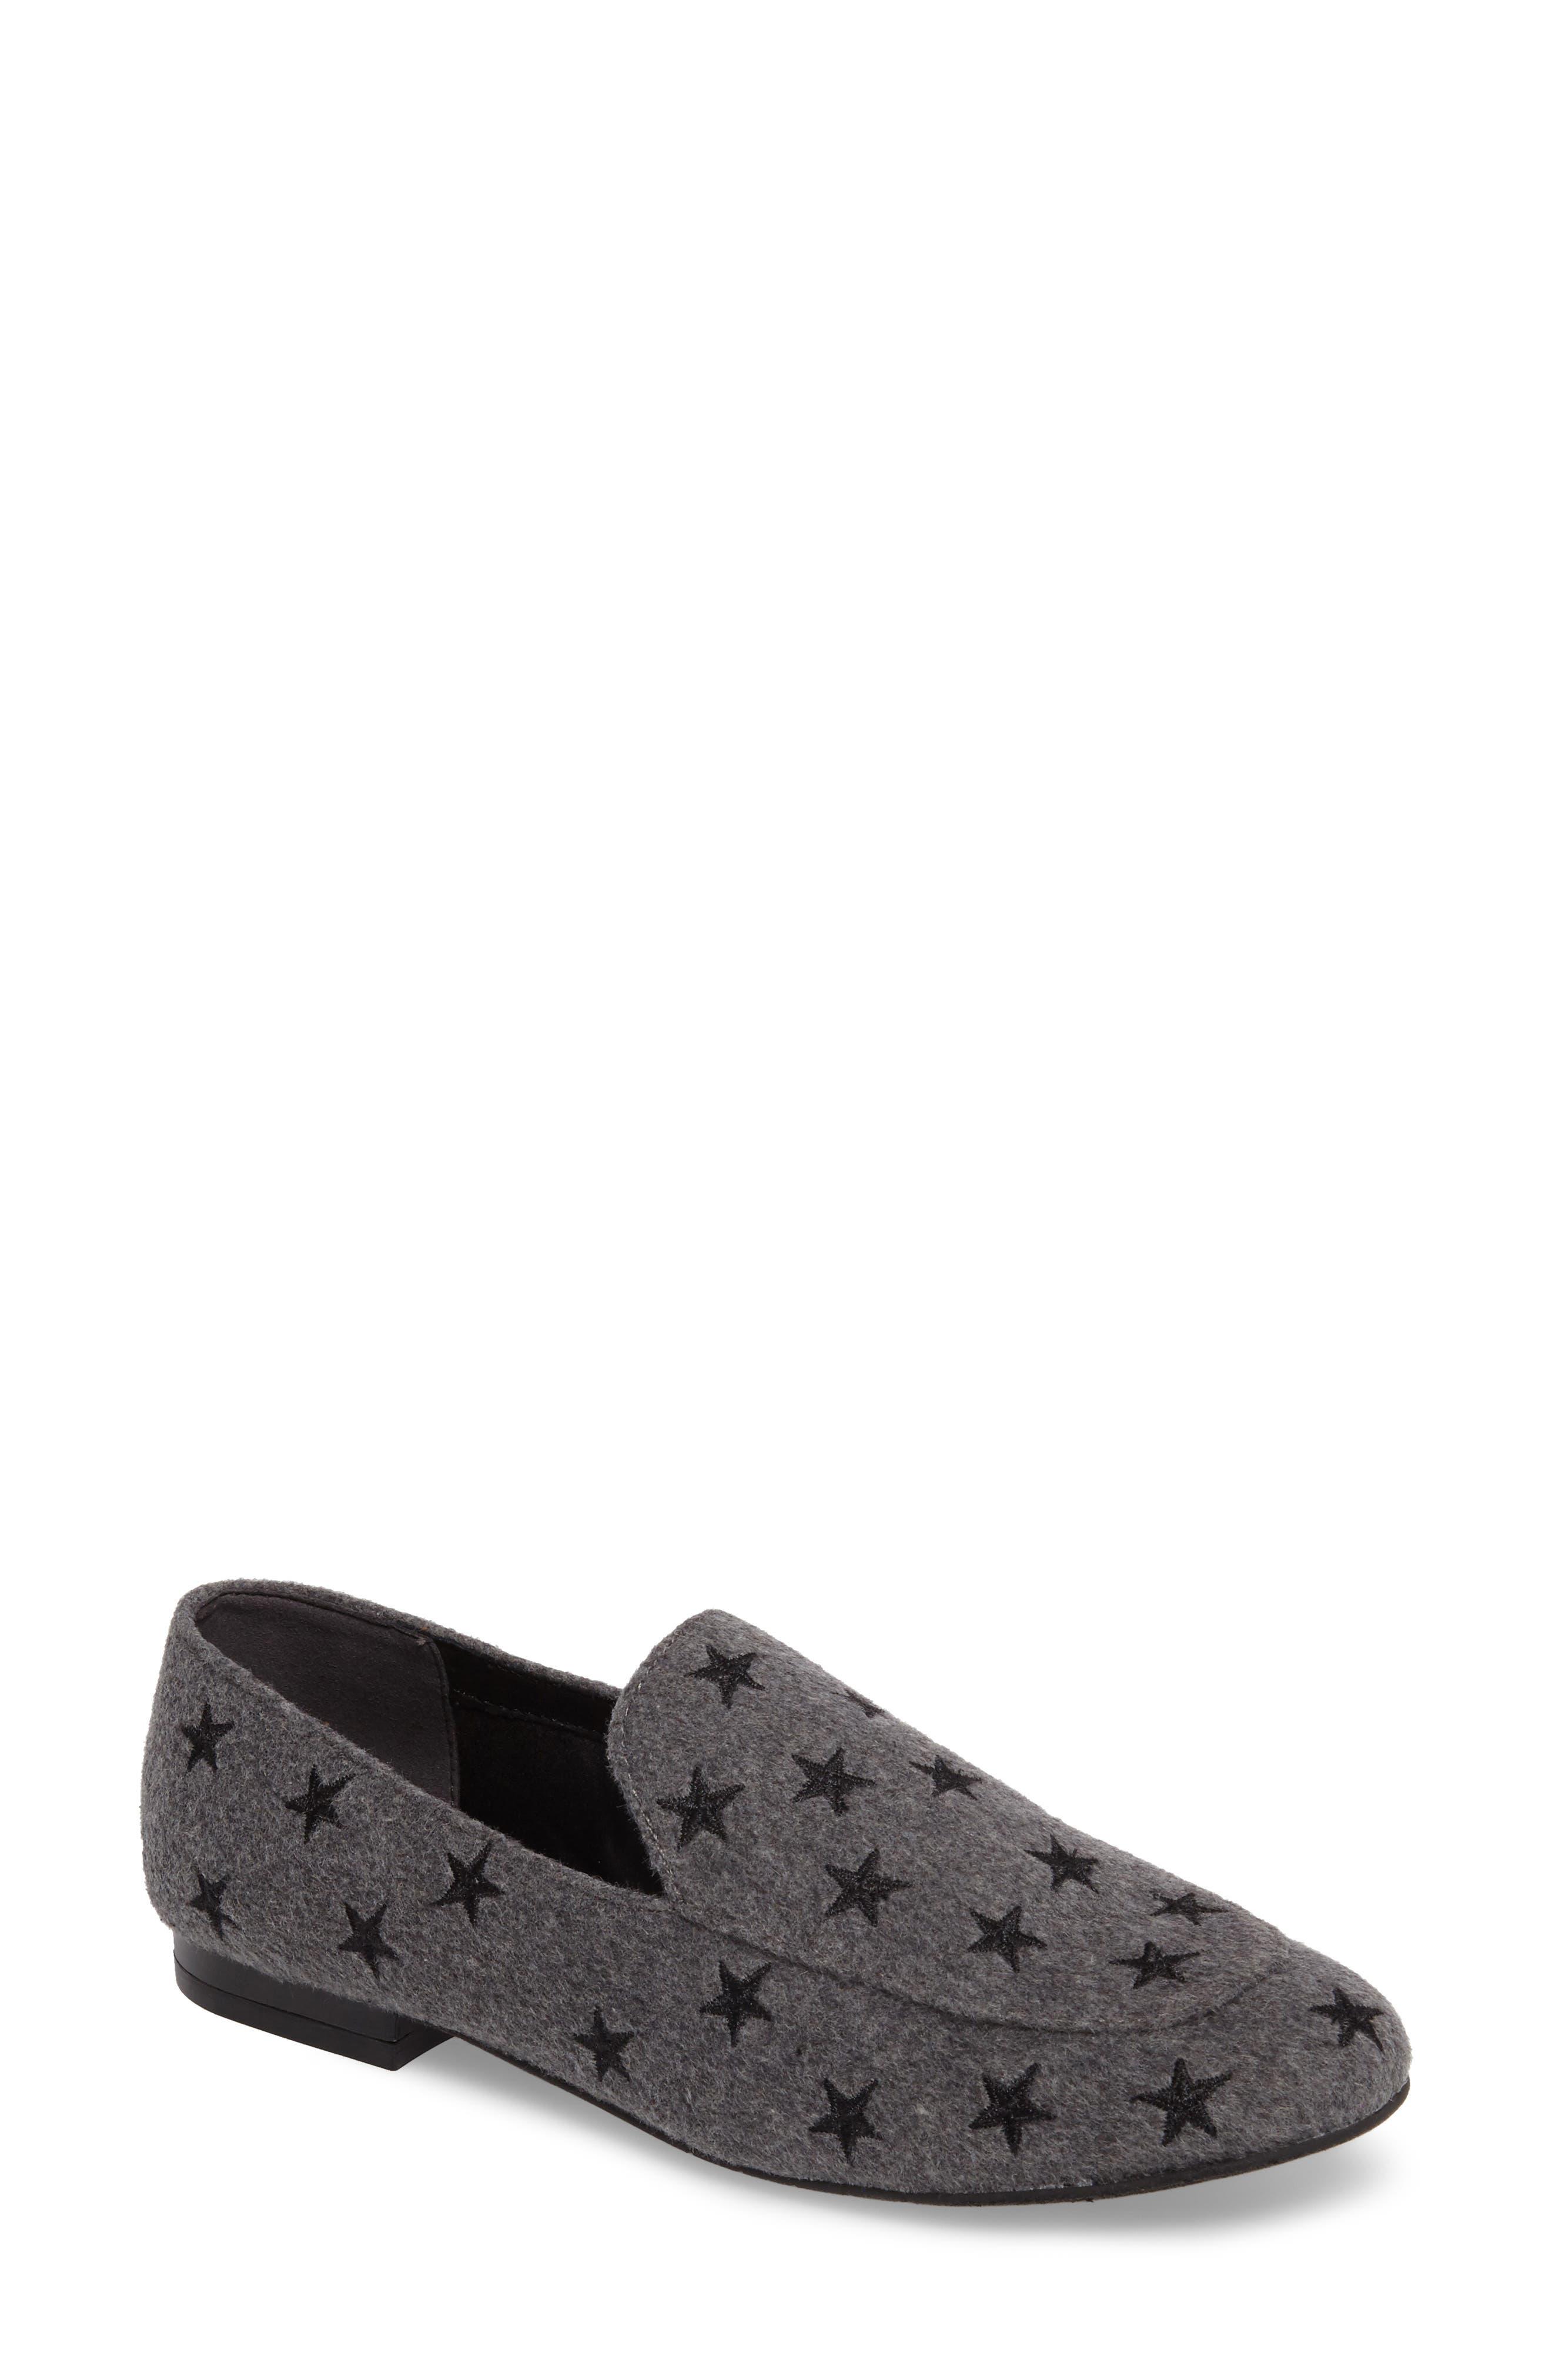 Westley 5 Loafer,                         Main,                         color, Grey Felt Fabric